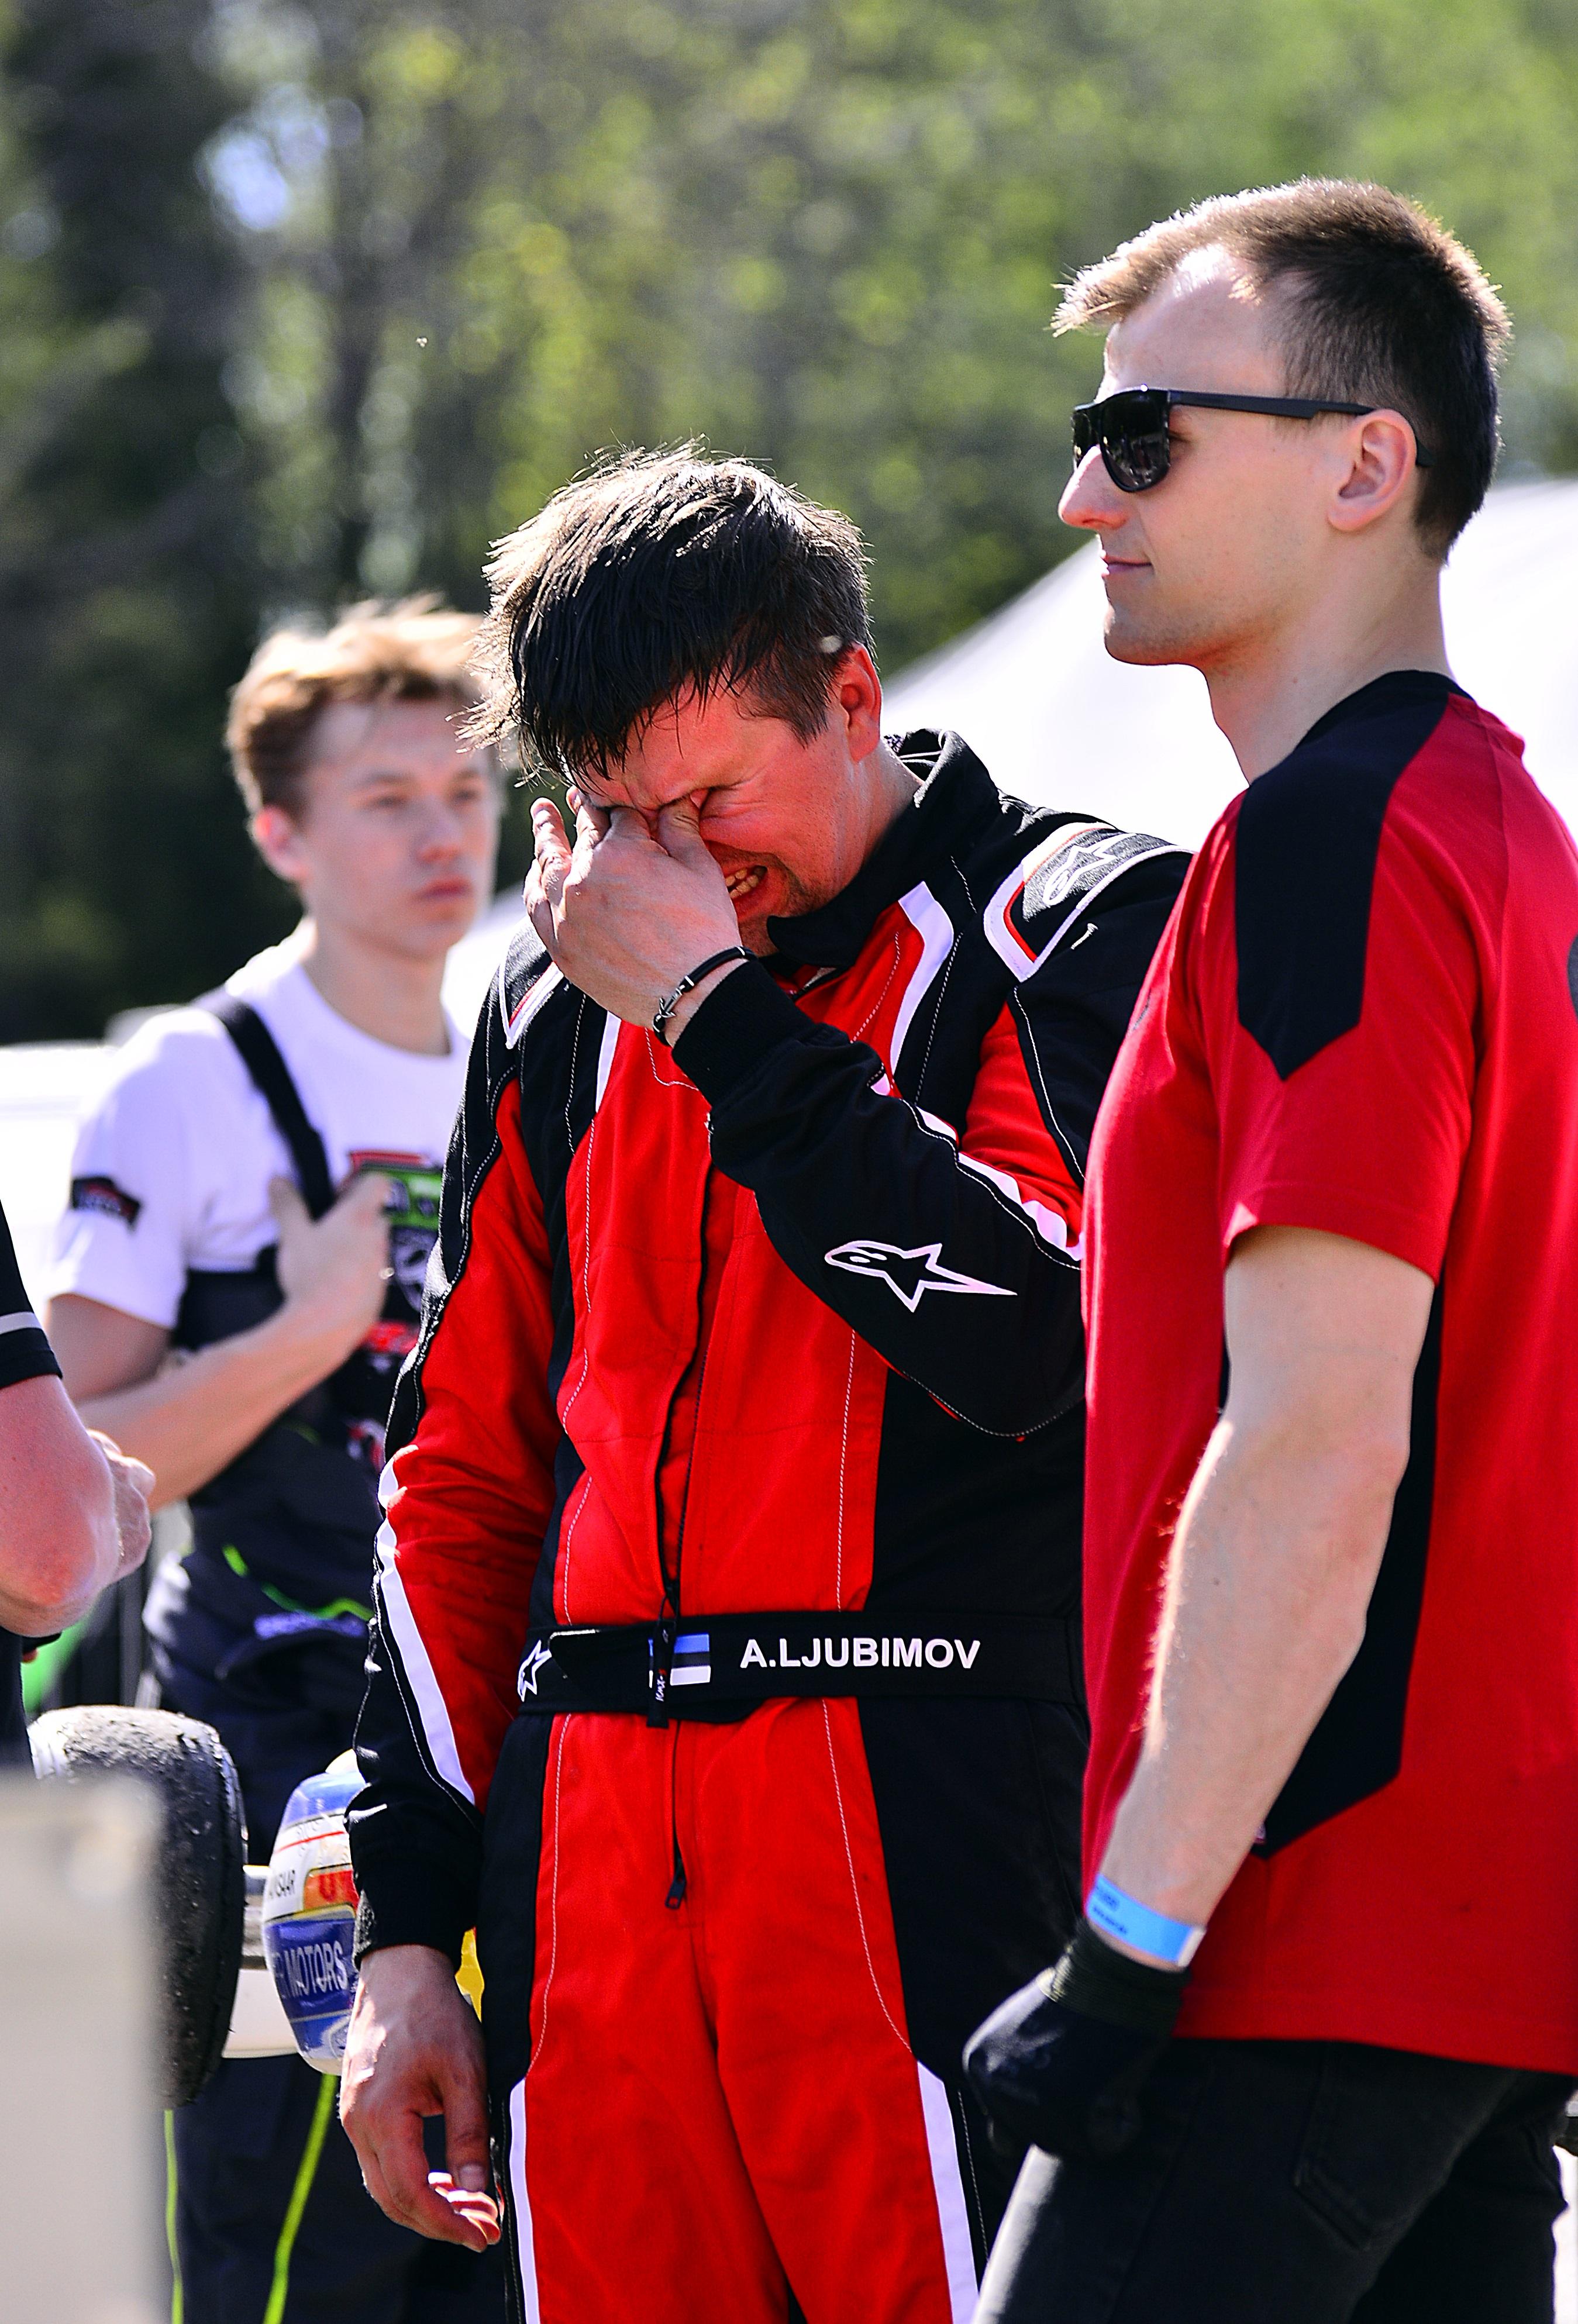 ags_racing_team_alexander_ljubimov